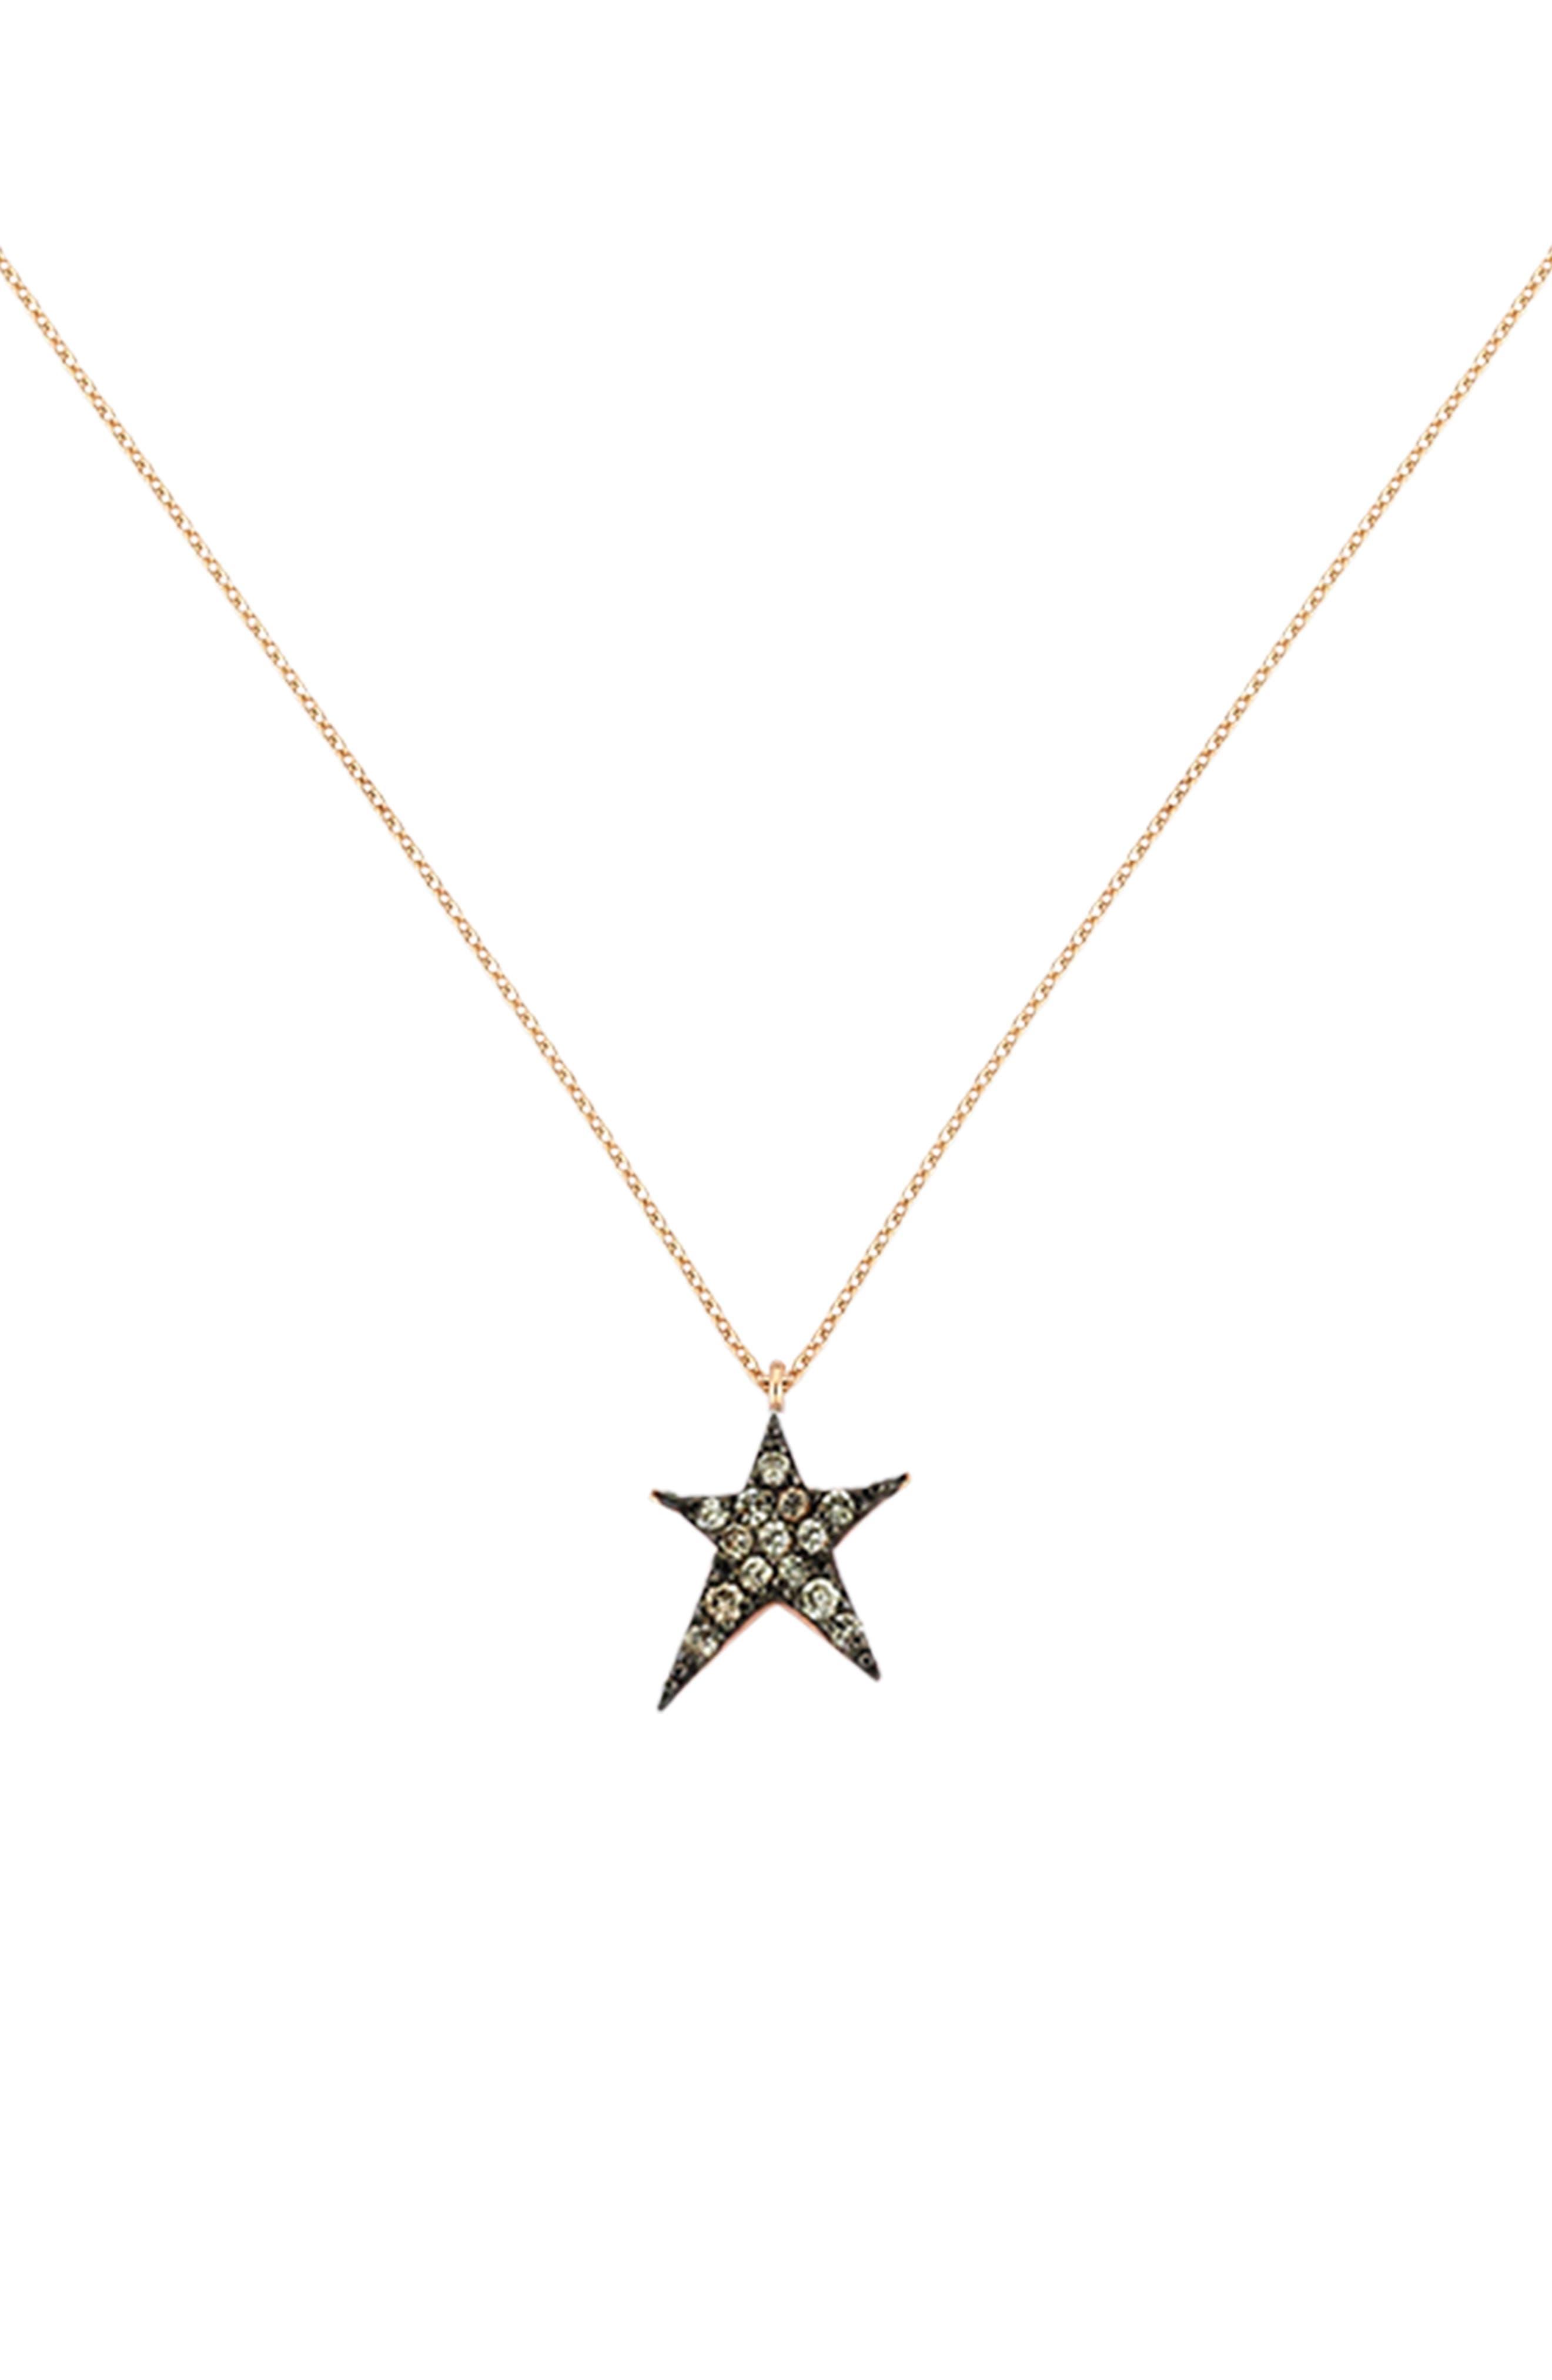 KISMET BY MILKA Struck Star Champagne Diamond Necklace, Main, color, ROSE GOLD